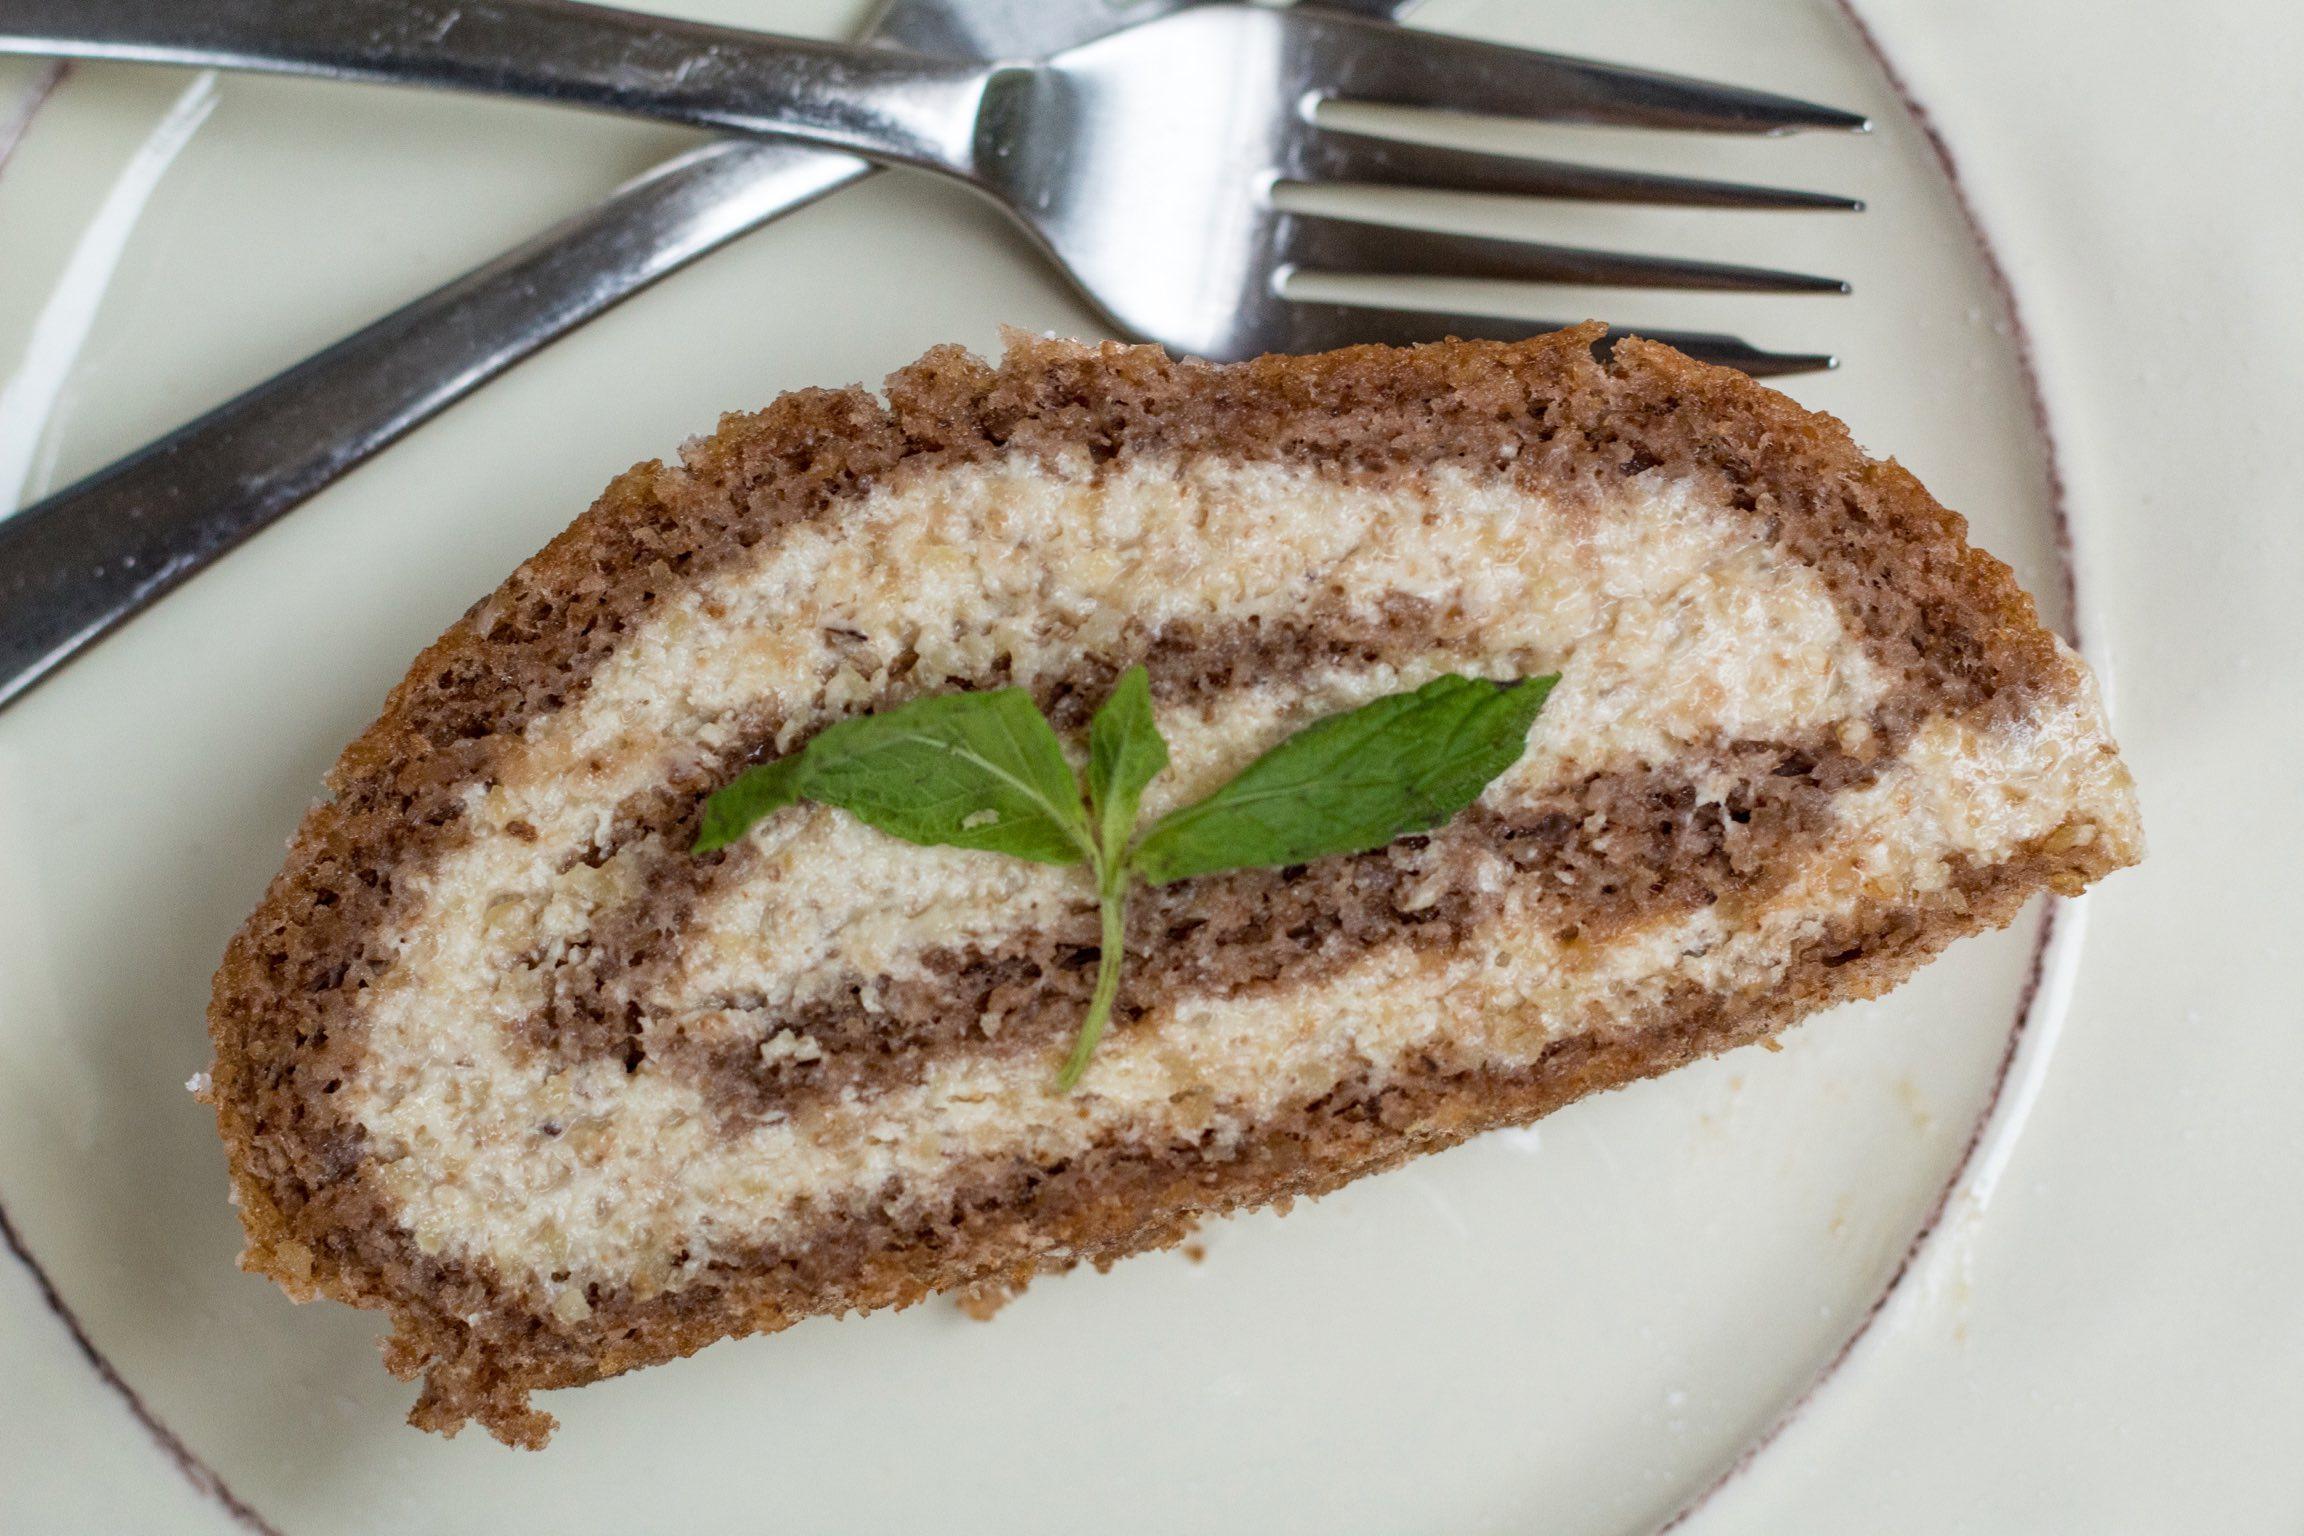 Gluten free walnut roll cake